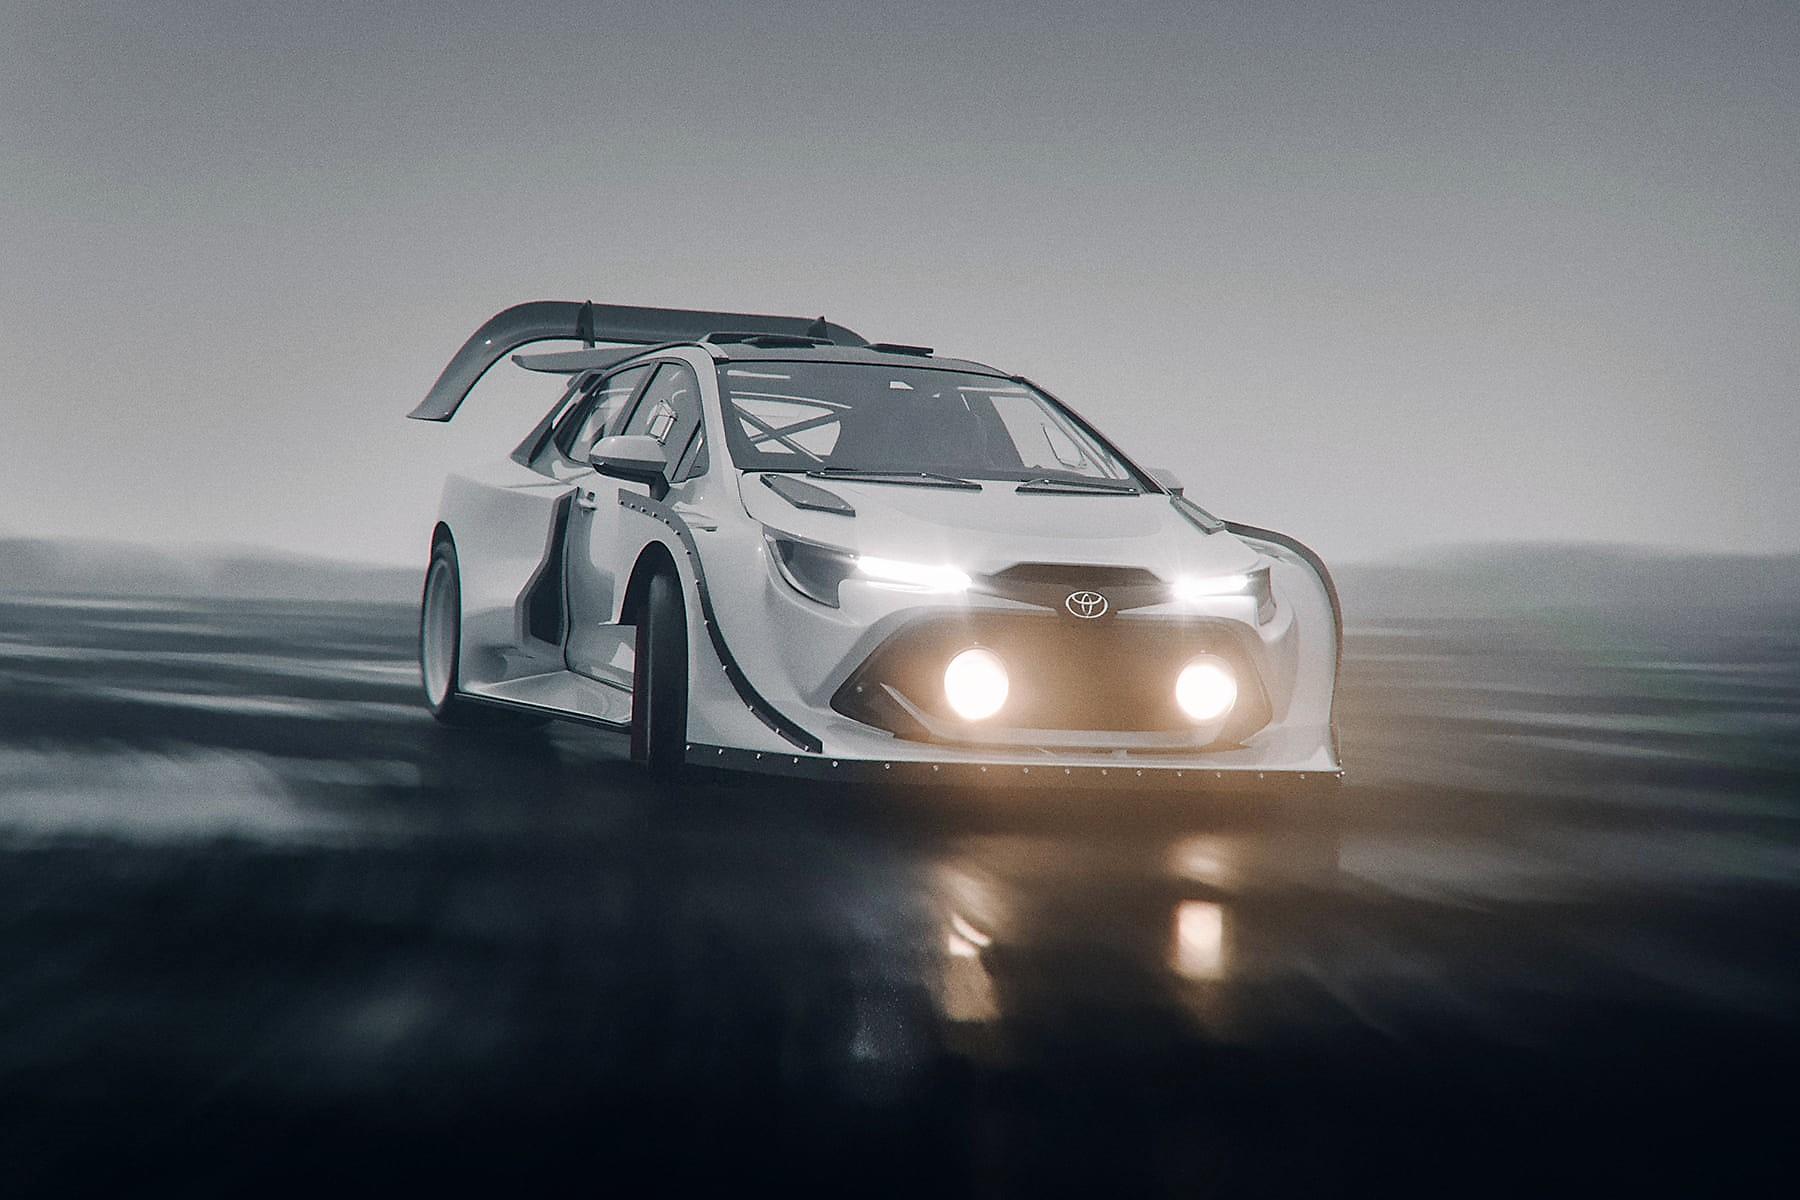 Toyota-GR-Corolla-Group-B-rally-car-1